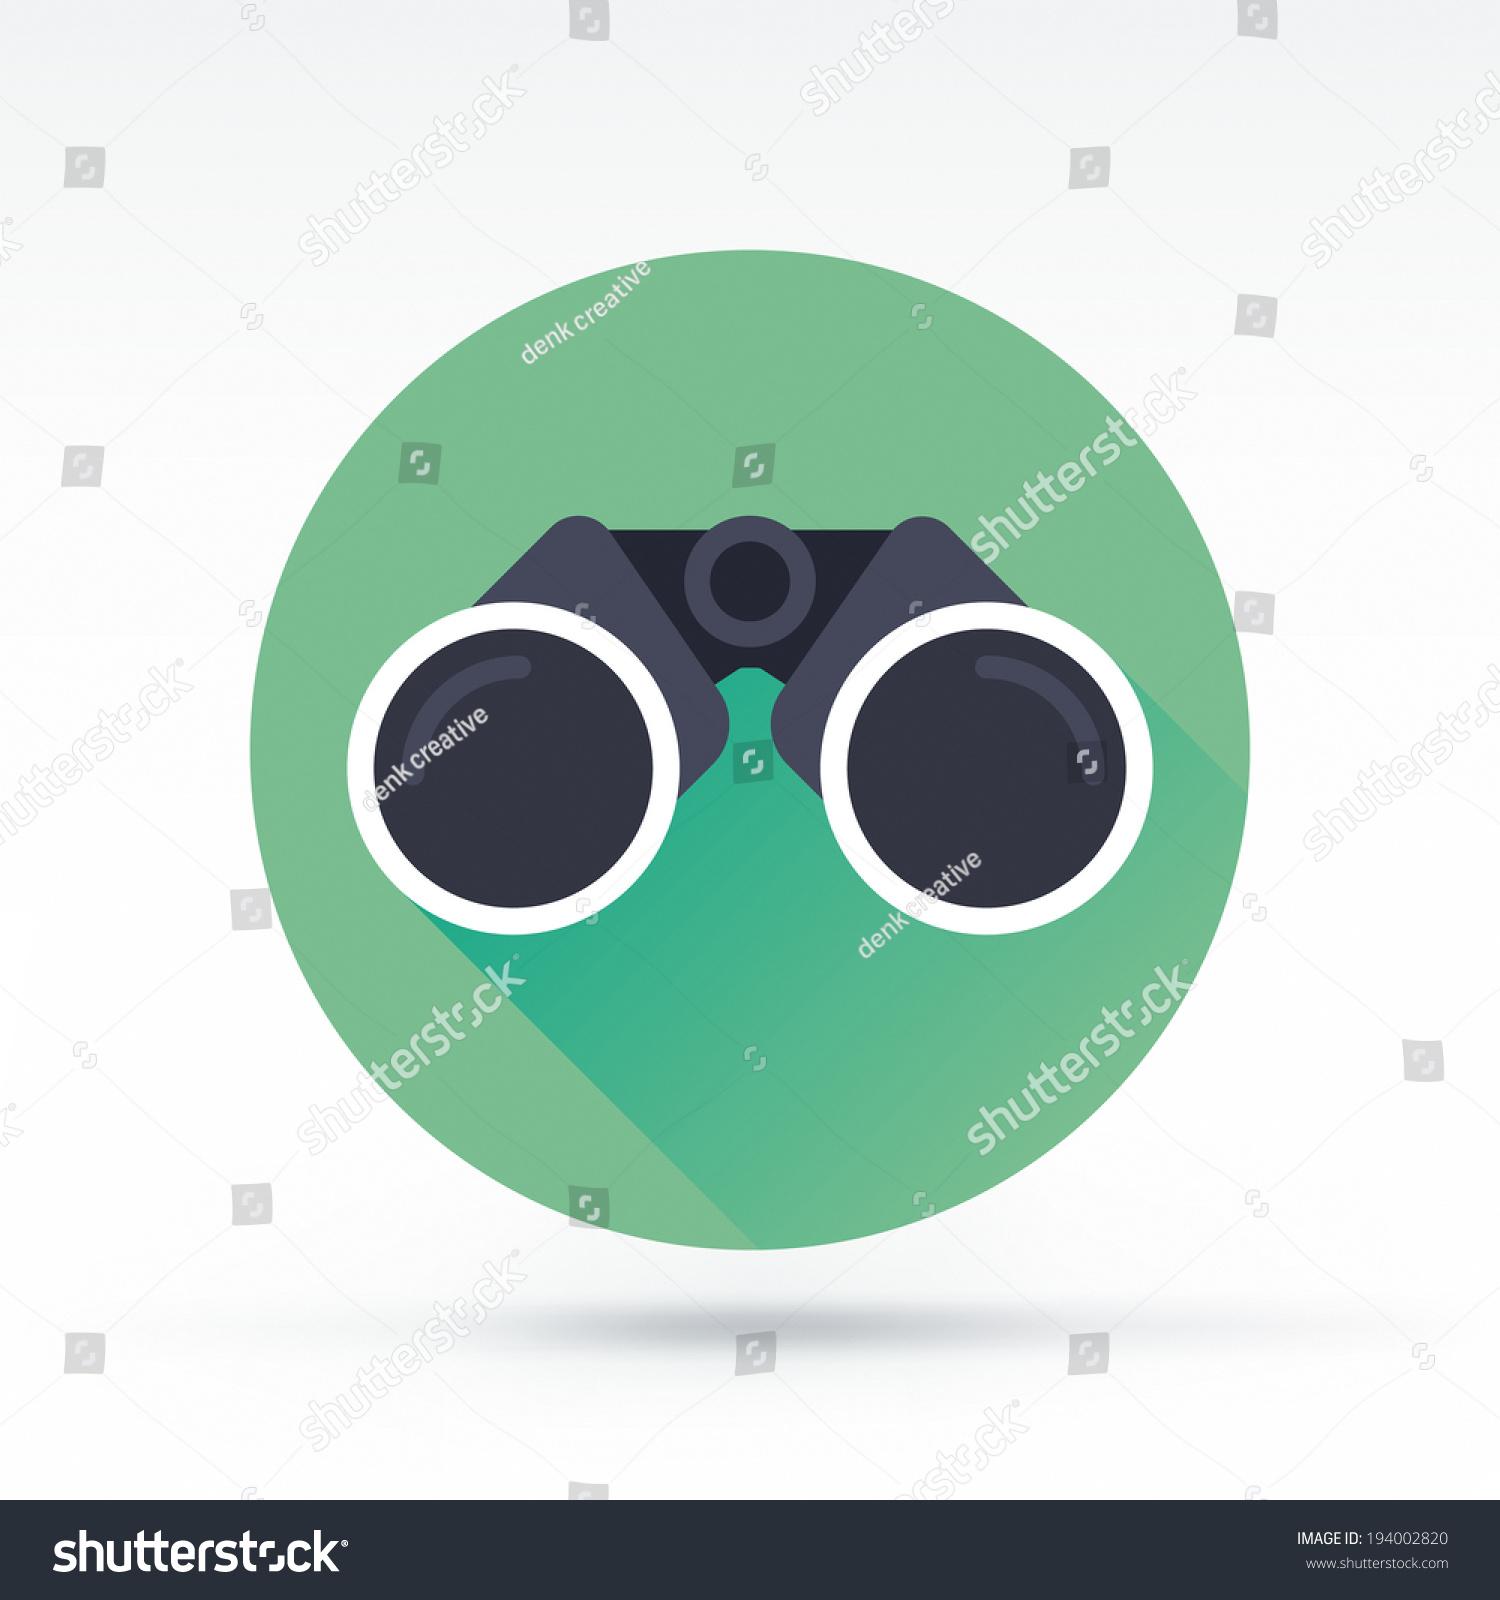 binoculars icon flat - photo #18